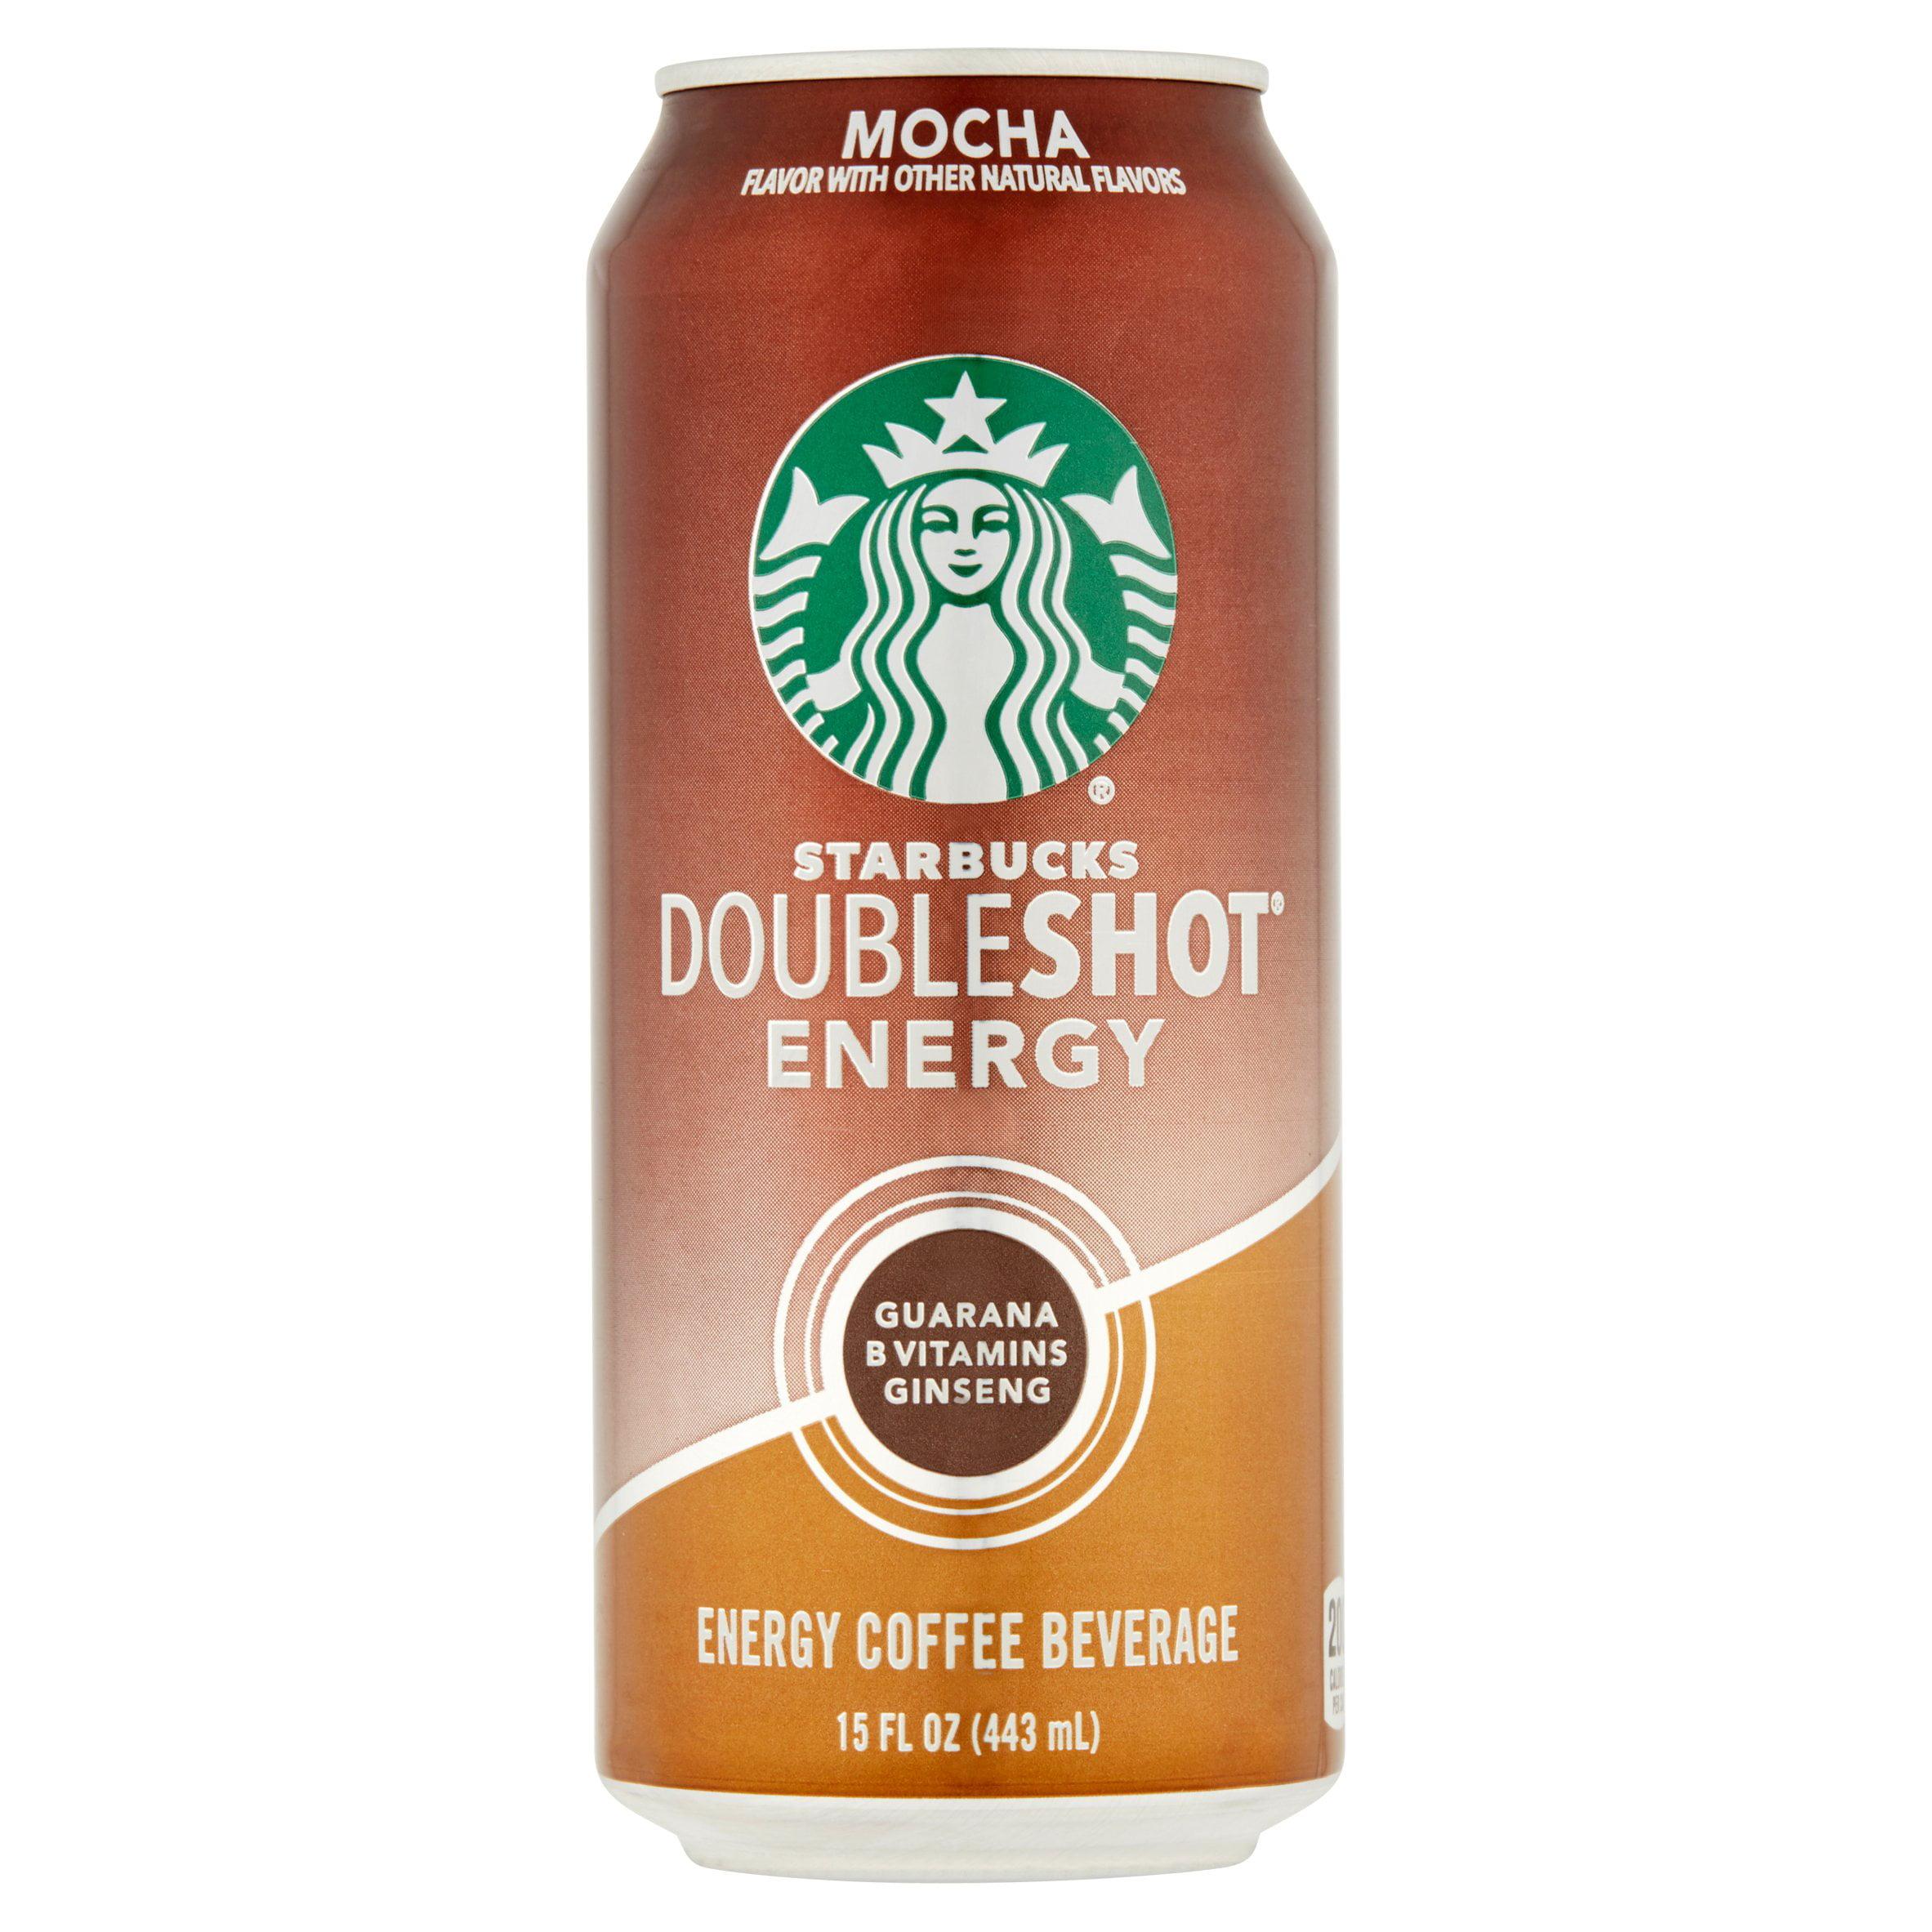 Starbucks Doubleshot Mocha Energy Coffee Beverage 15 Fl Oz